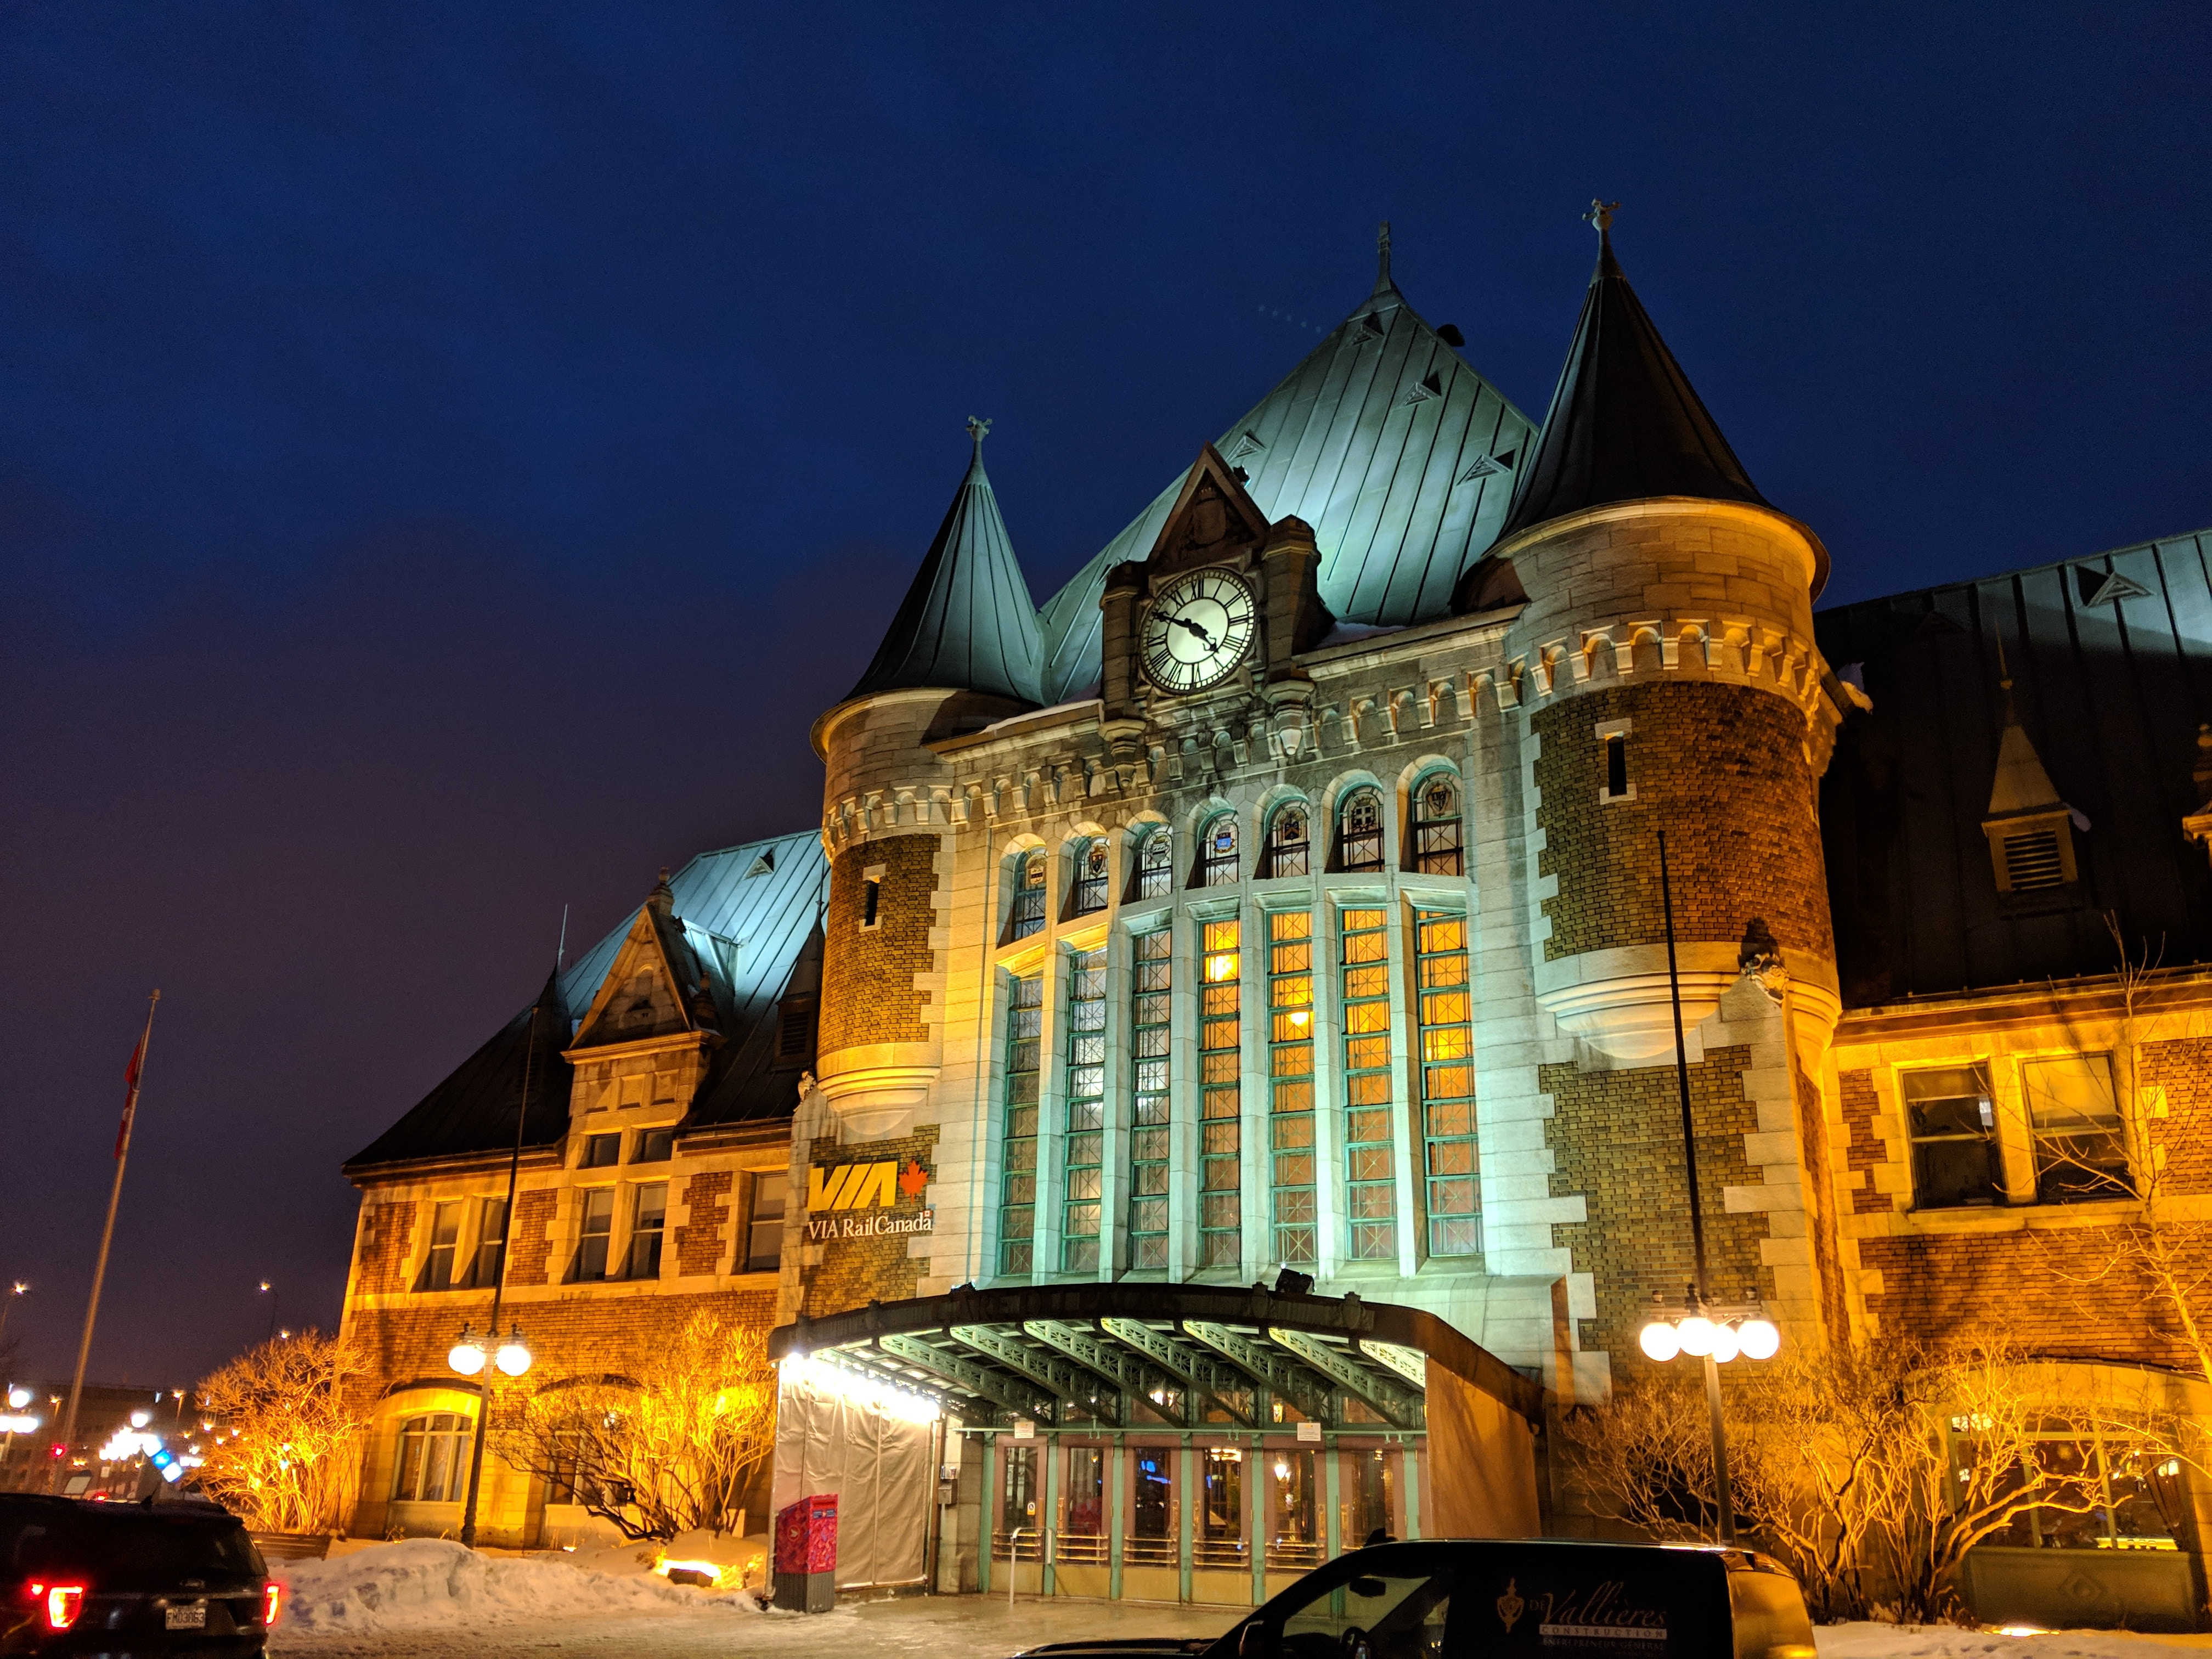 Quebec City train station